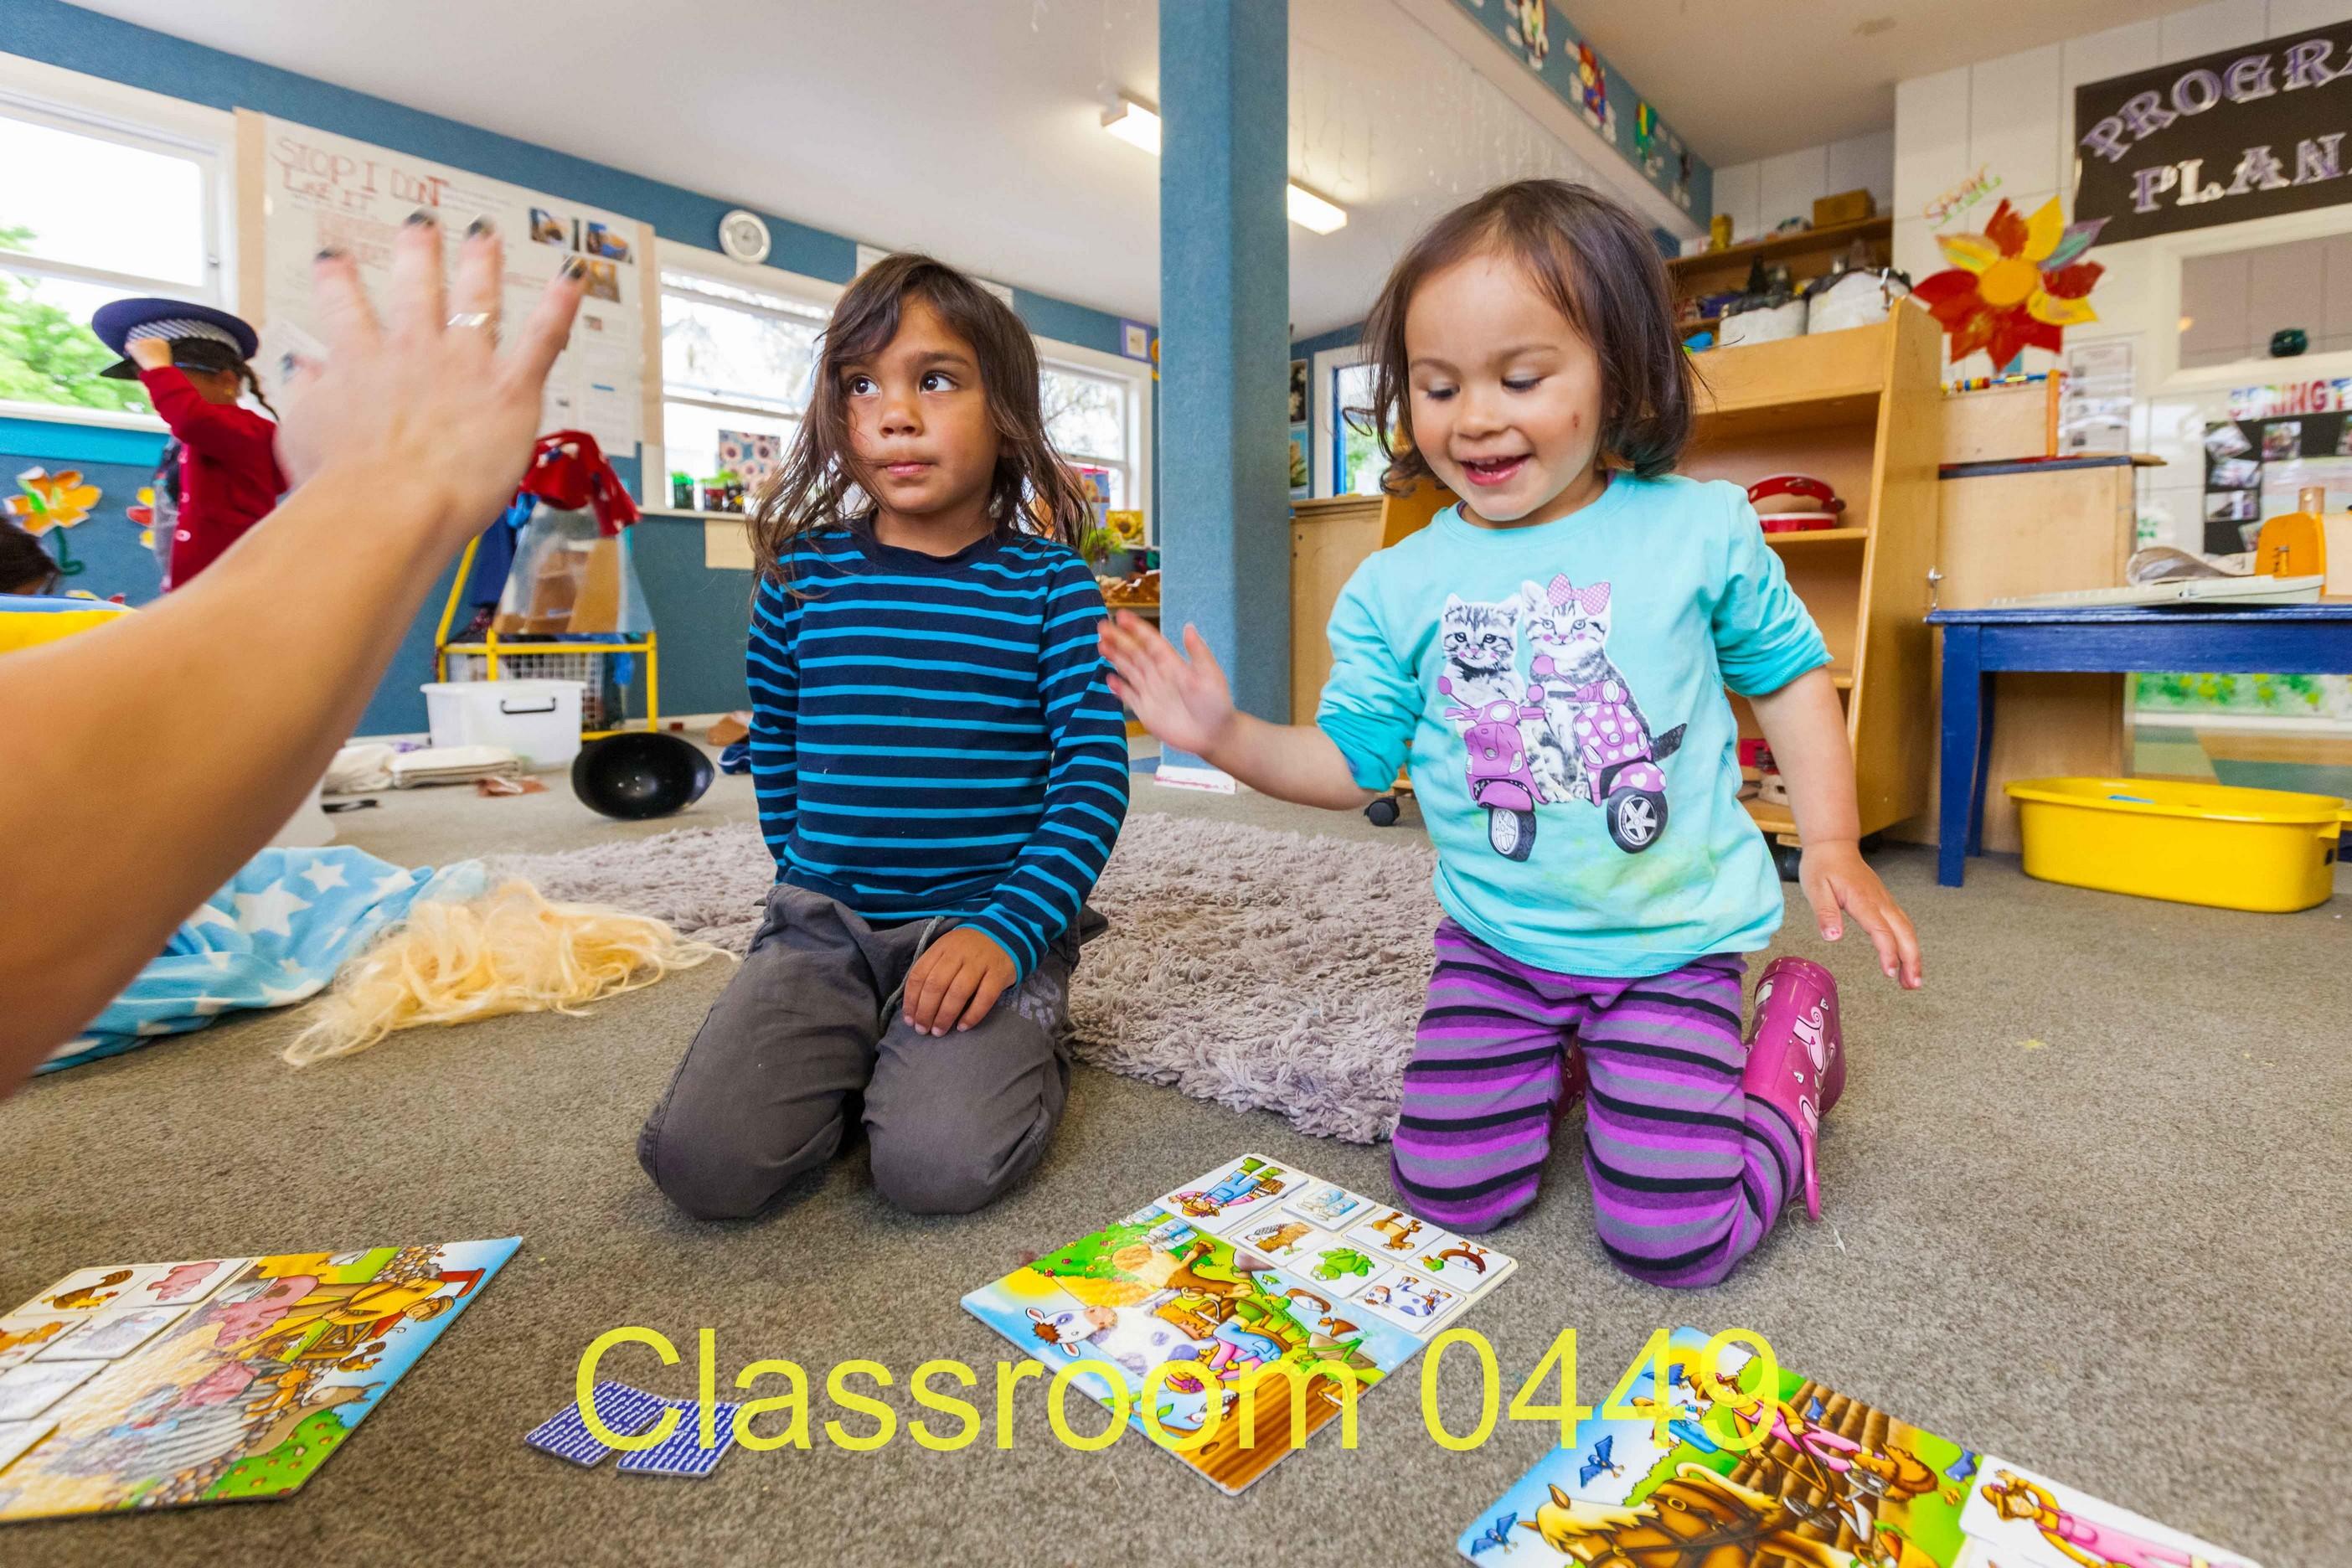 Classroom 0449